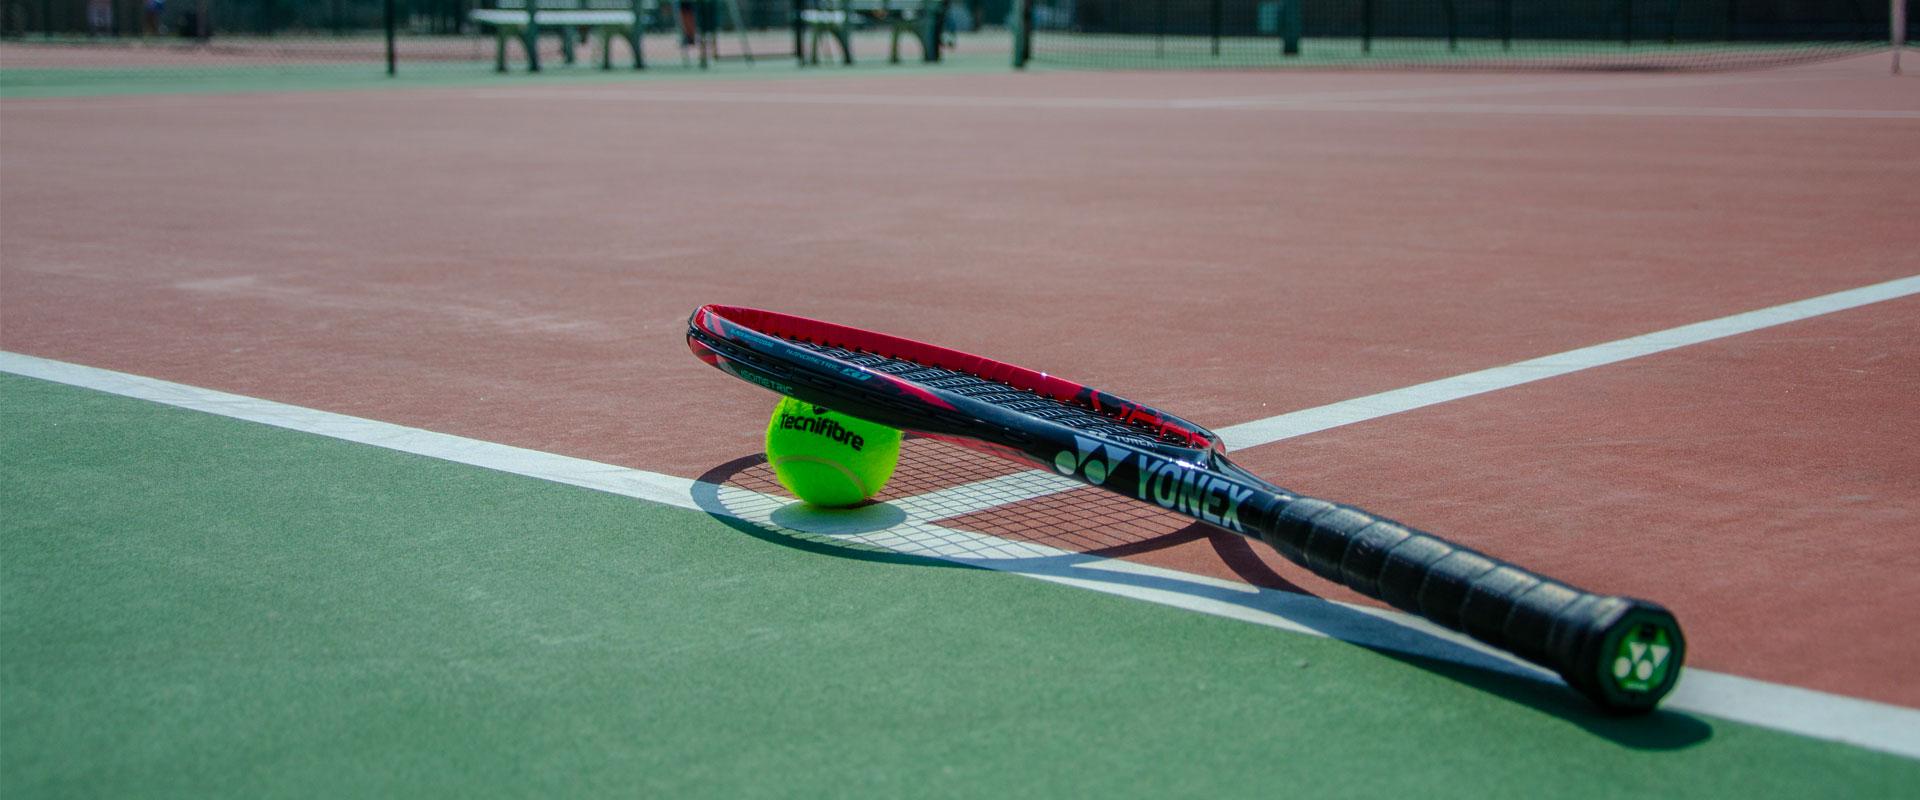 Home - Complexe Sportif Rene Magnac - Tennis - Piscine ... concernant Piscine René Magnac